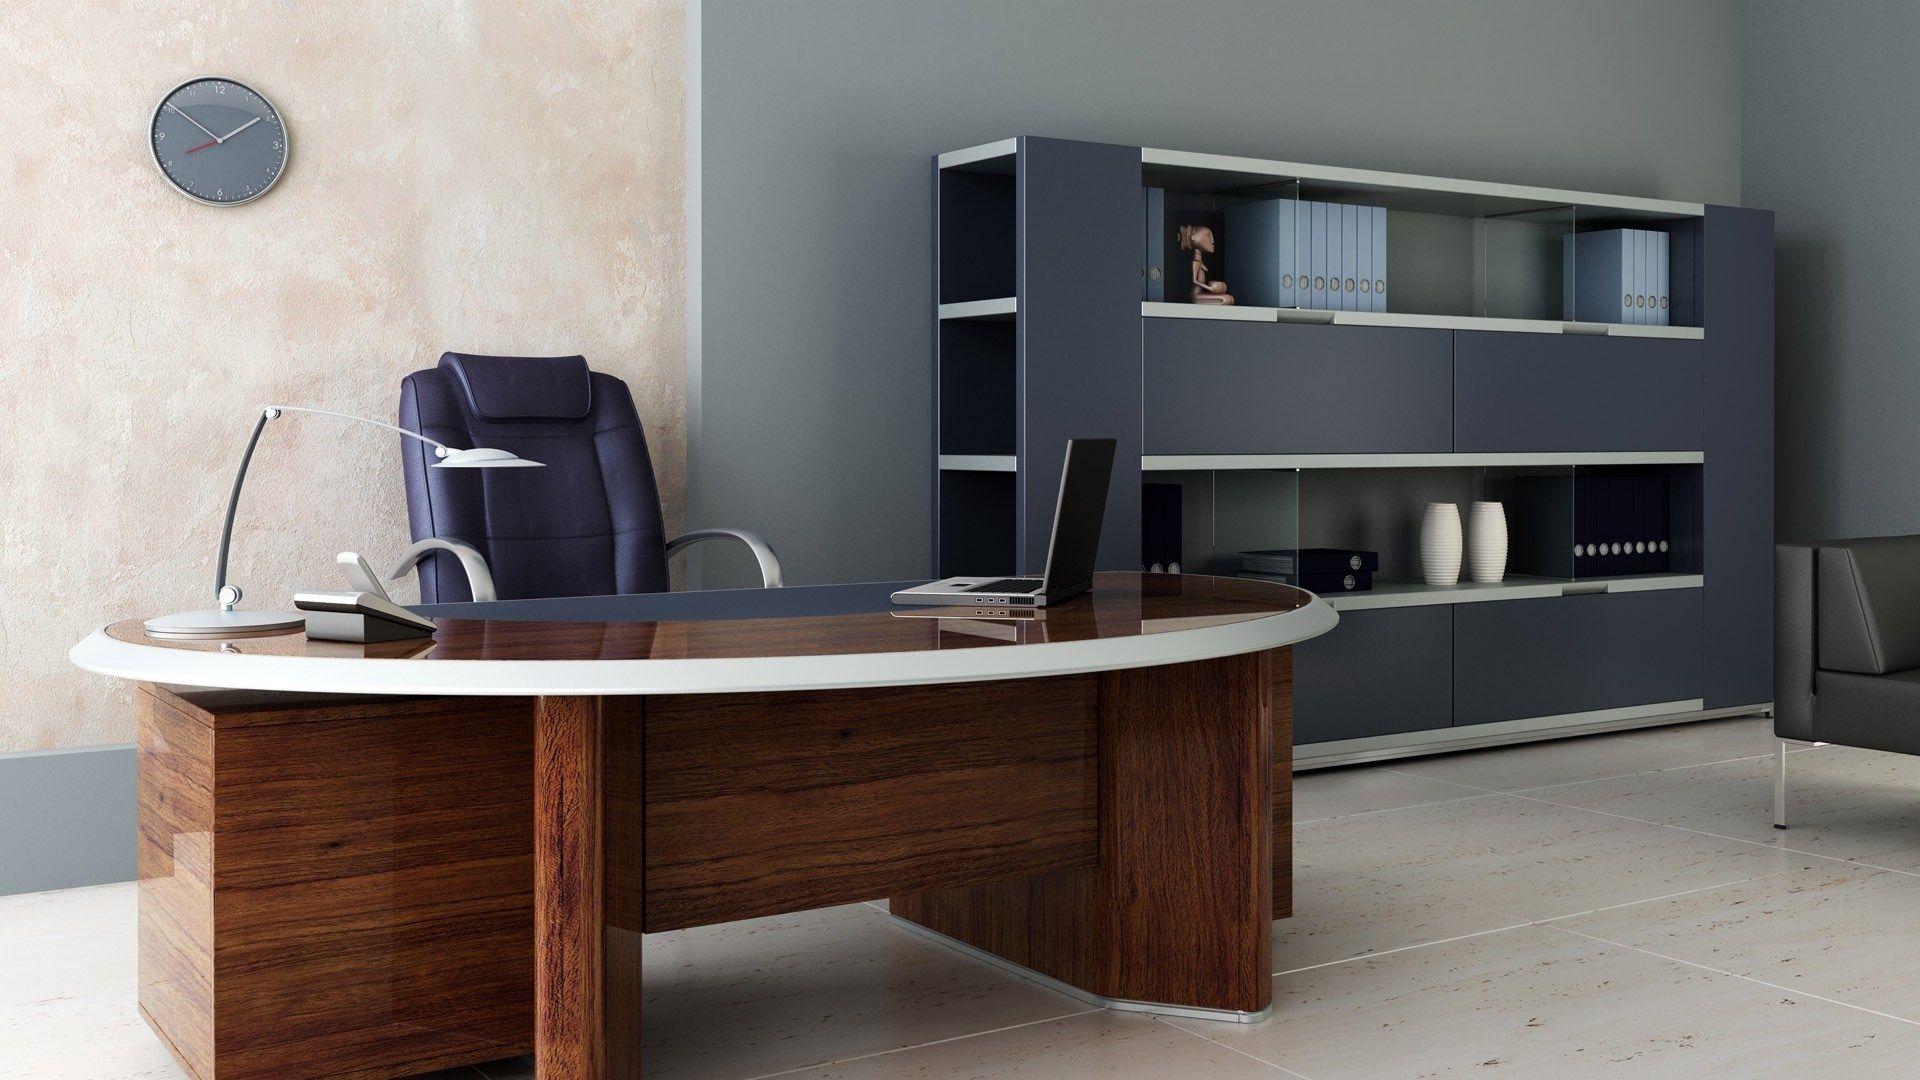 Office Desk Wallpaper Business 1920x1080 Wallpaper Room Office